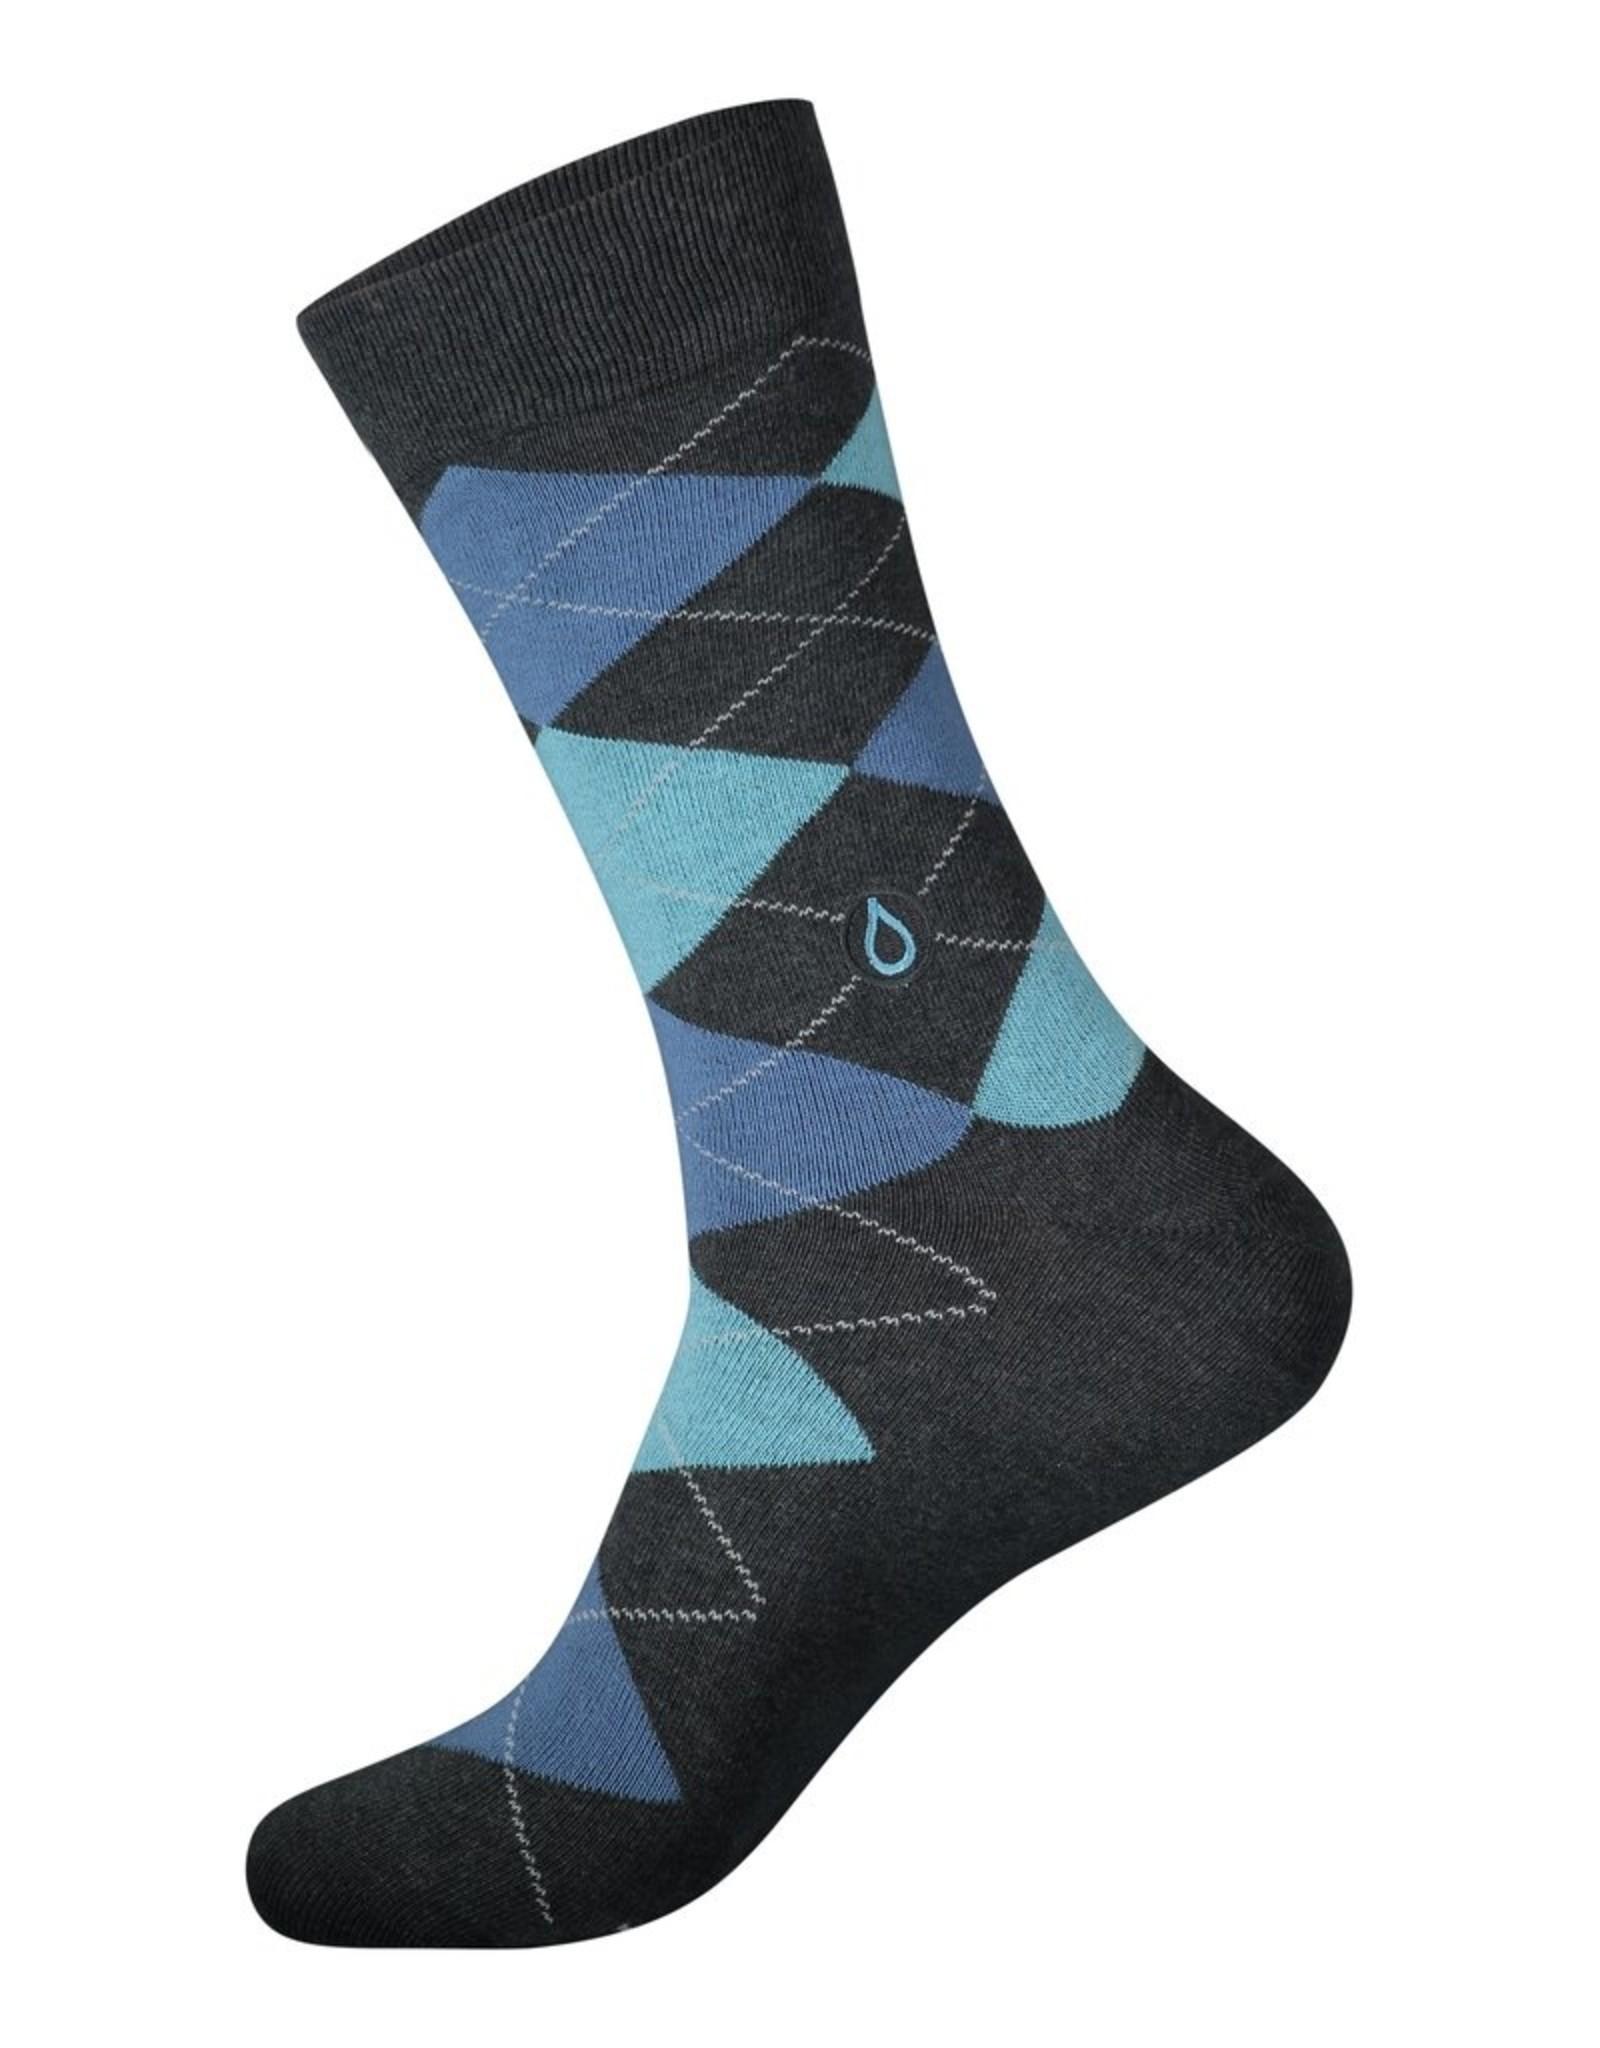 Conscious Step Organic Cotton Socks